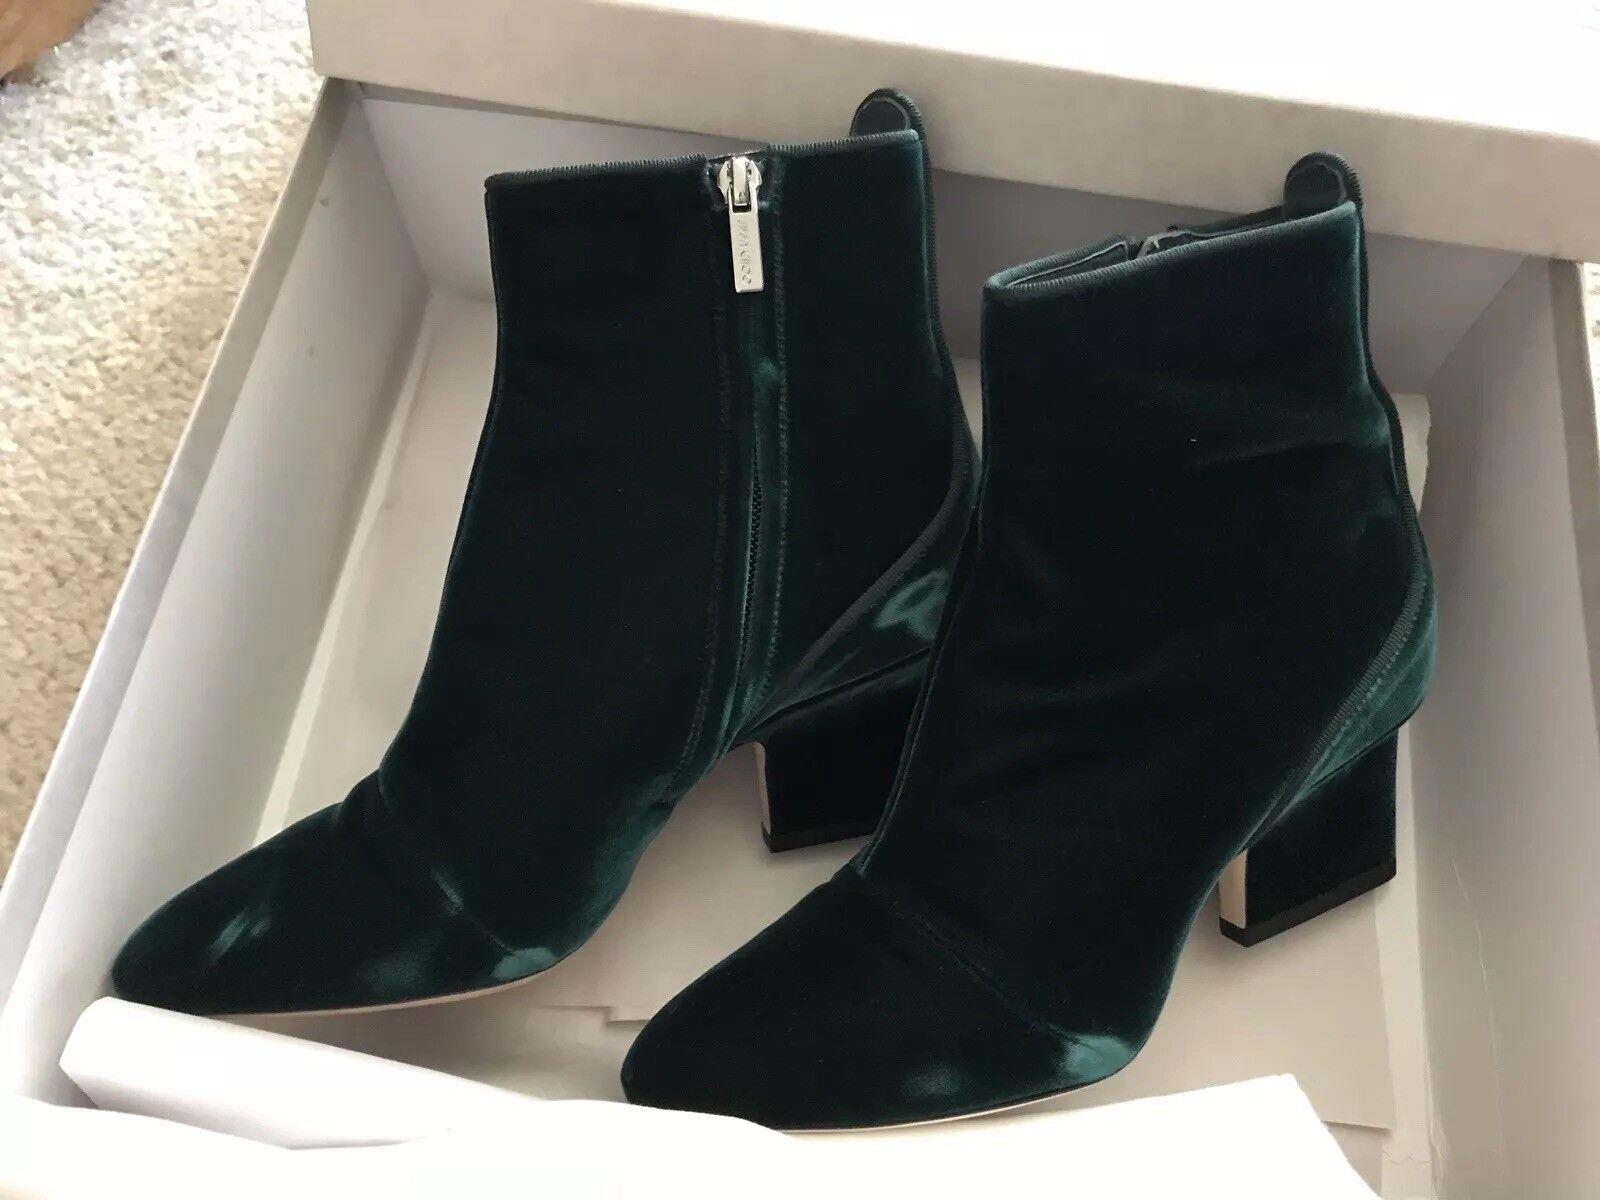 Jimmy Choo otoño otoño otoño de 65 botines de terciopelo, verde botella, talla 37  venta caliente